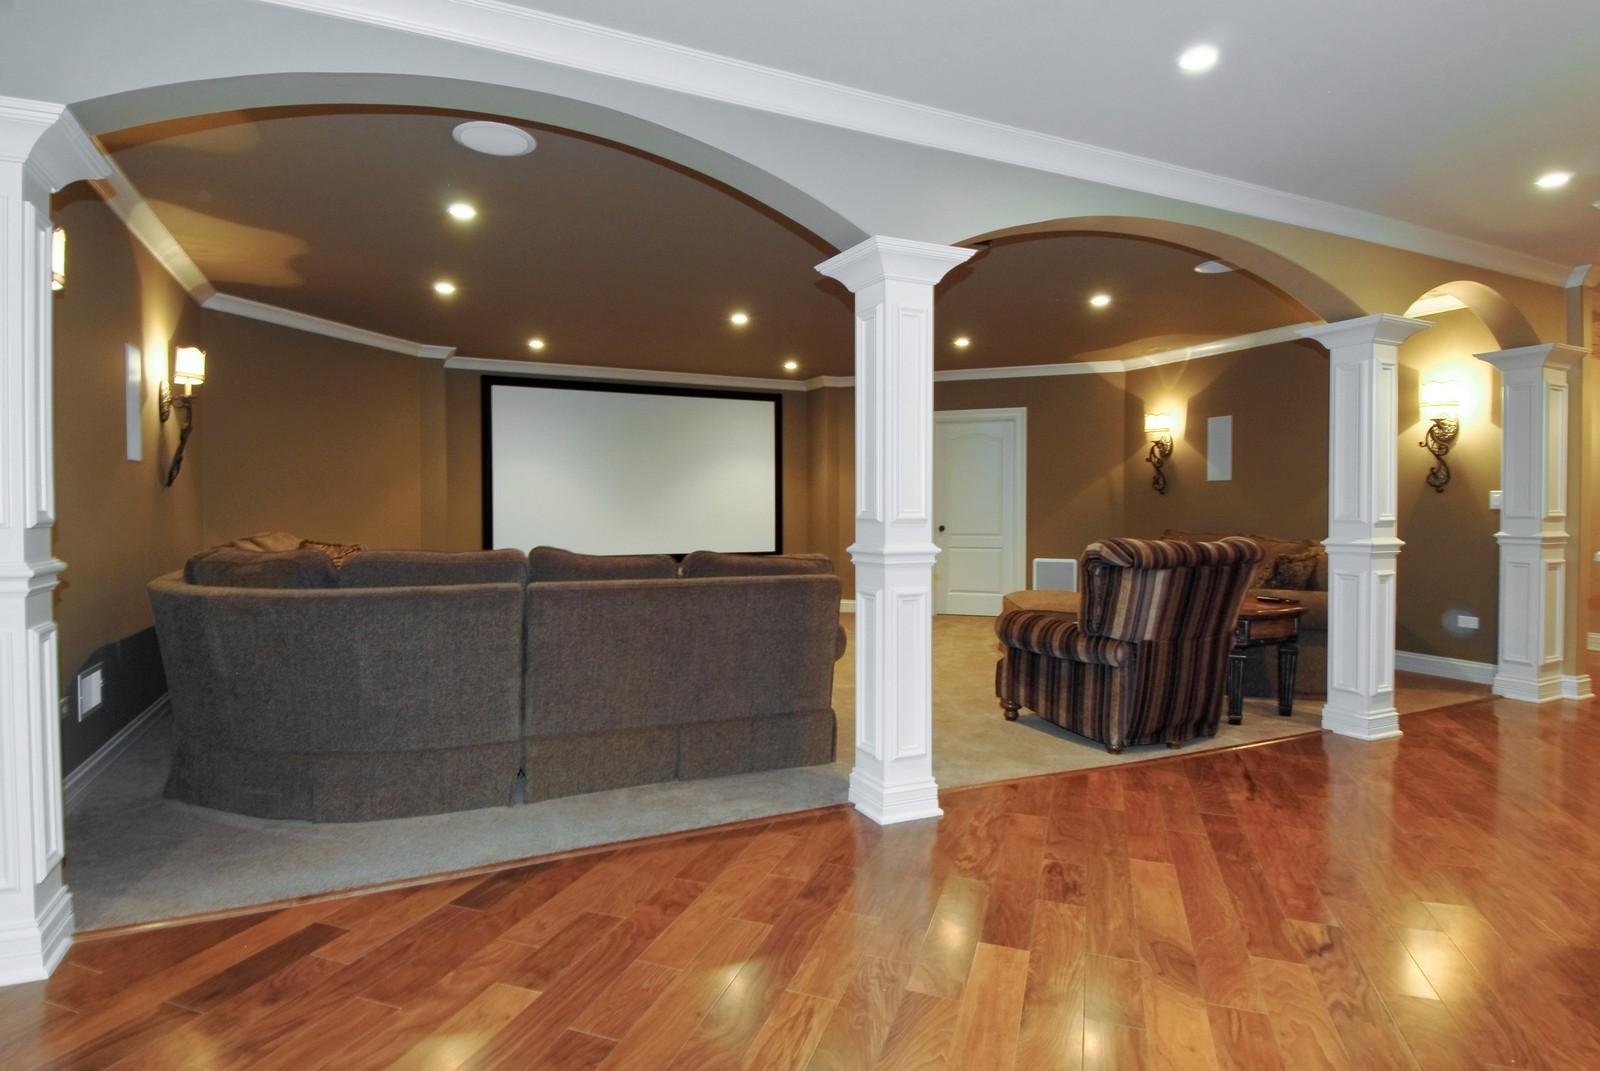 Real Estate Photography - 729 Wellner Dr, Naperville, IL, 60540 - Basement